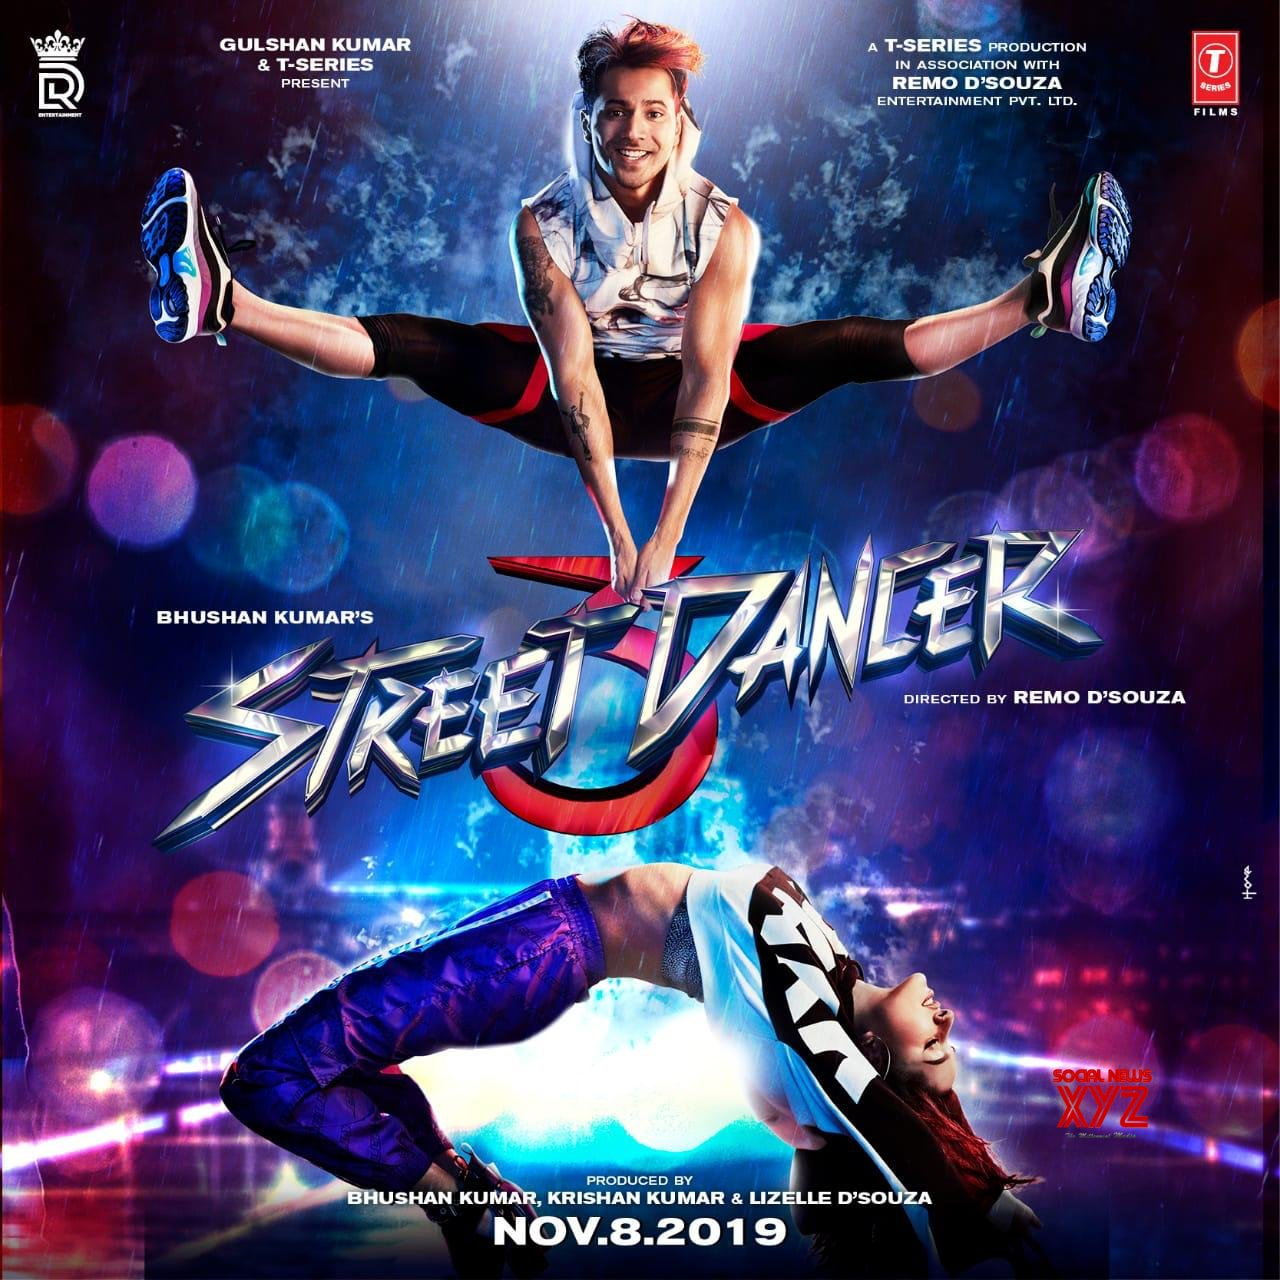 Street Dancer 3D Movie Posters & Still